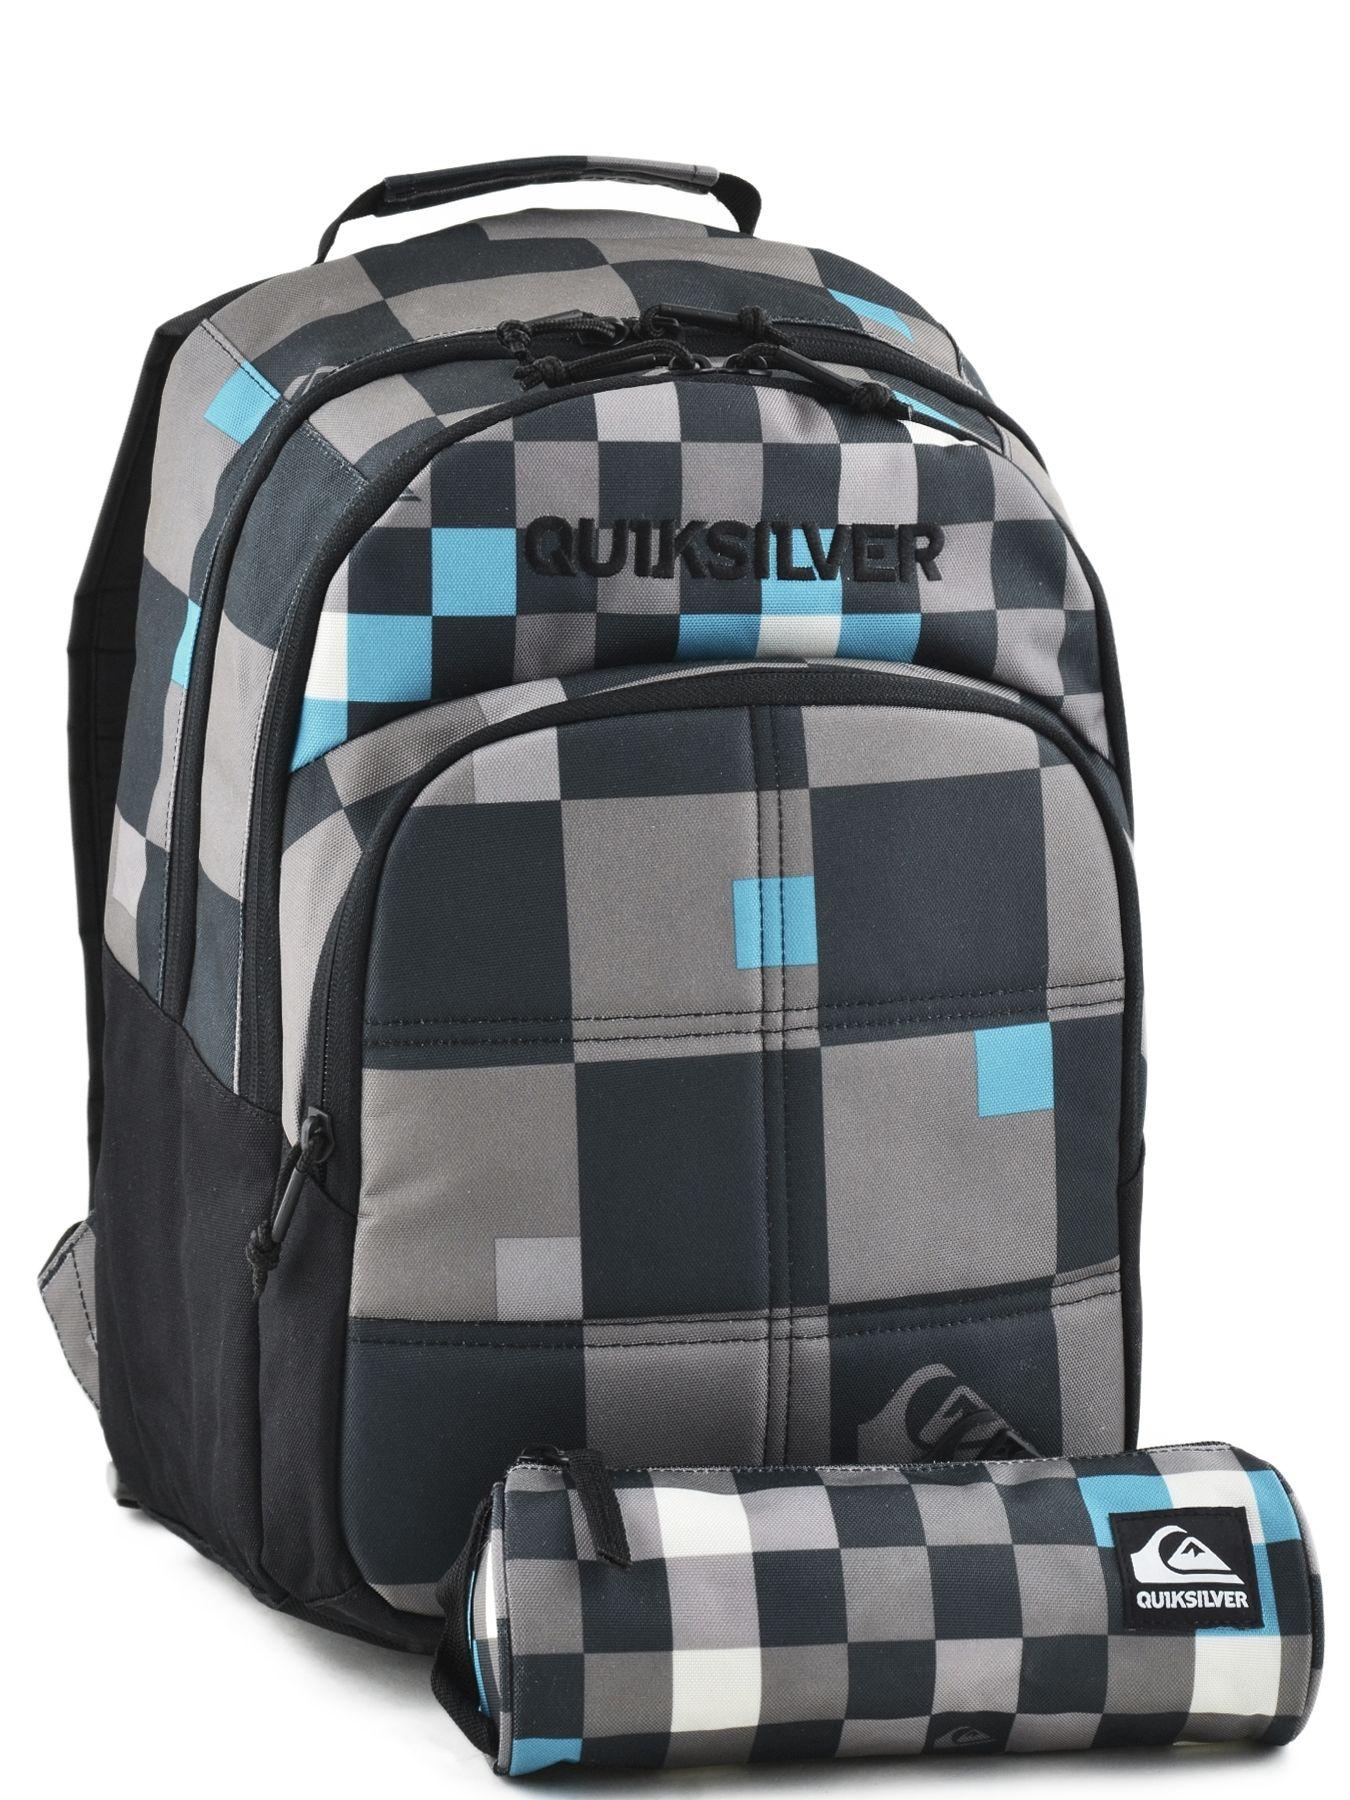 sac dos quiksilver metal backpacks eqybp043. Black Bedroom Furniture Sets. Home Design Ideas